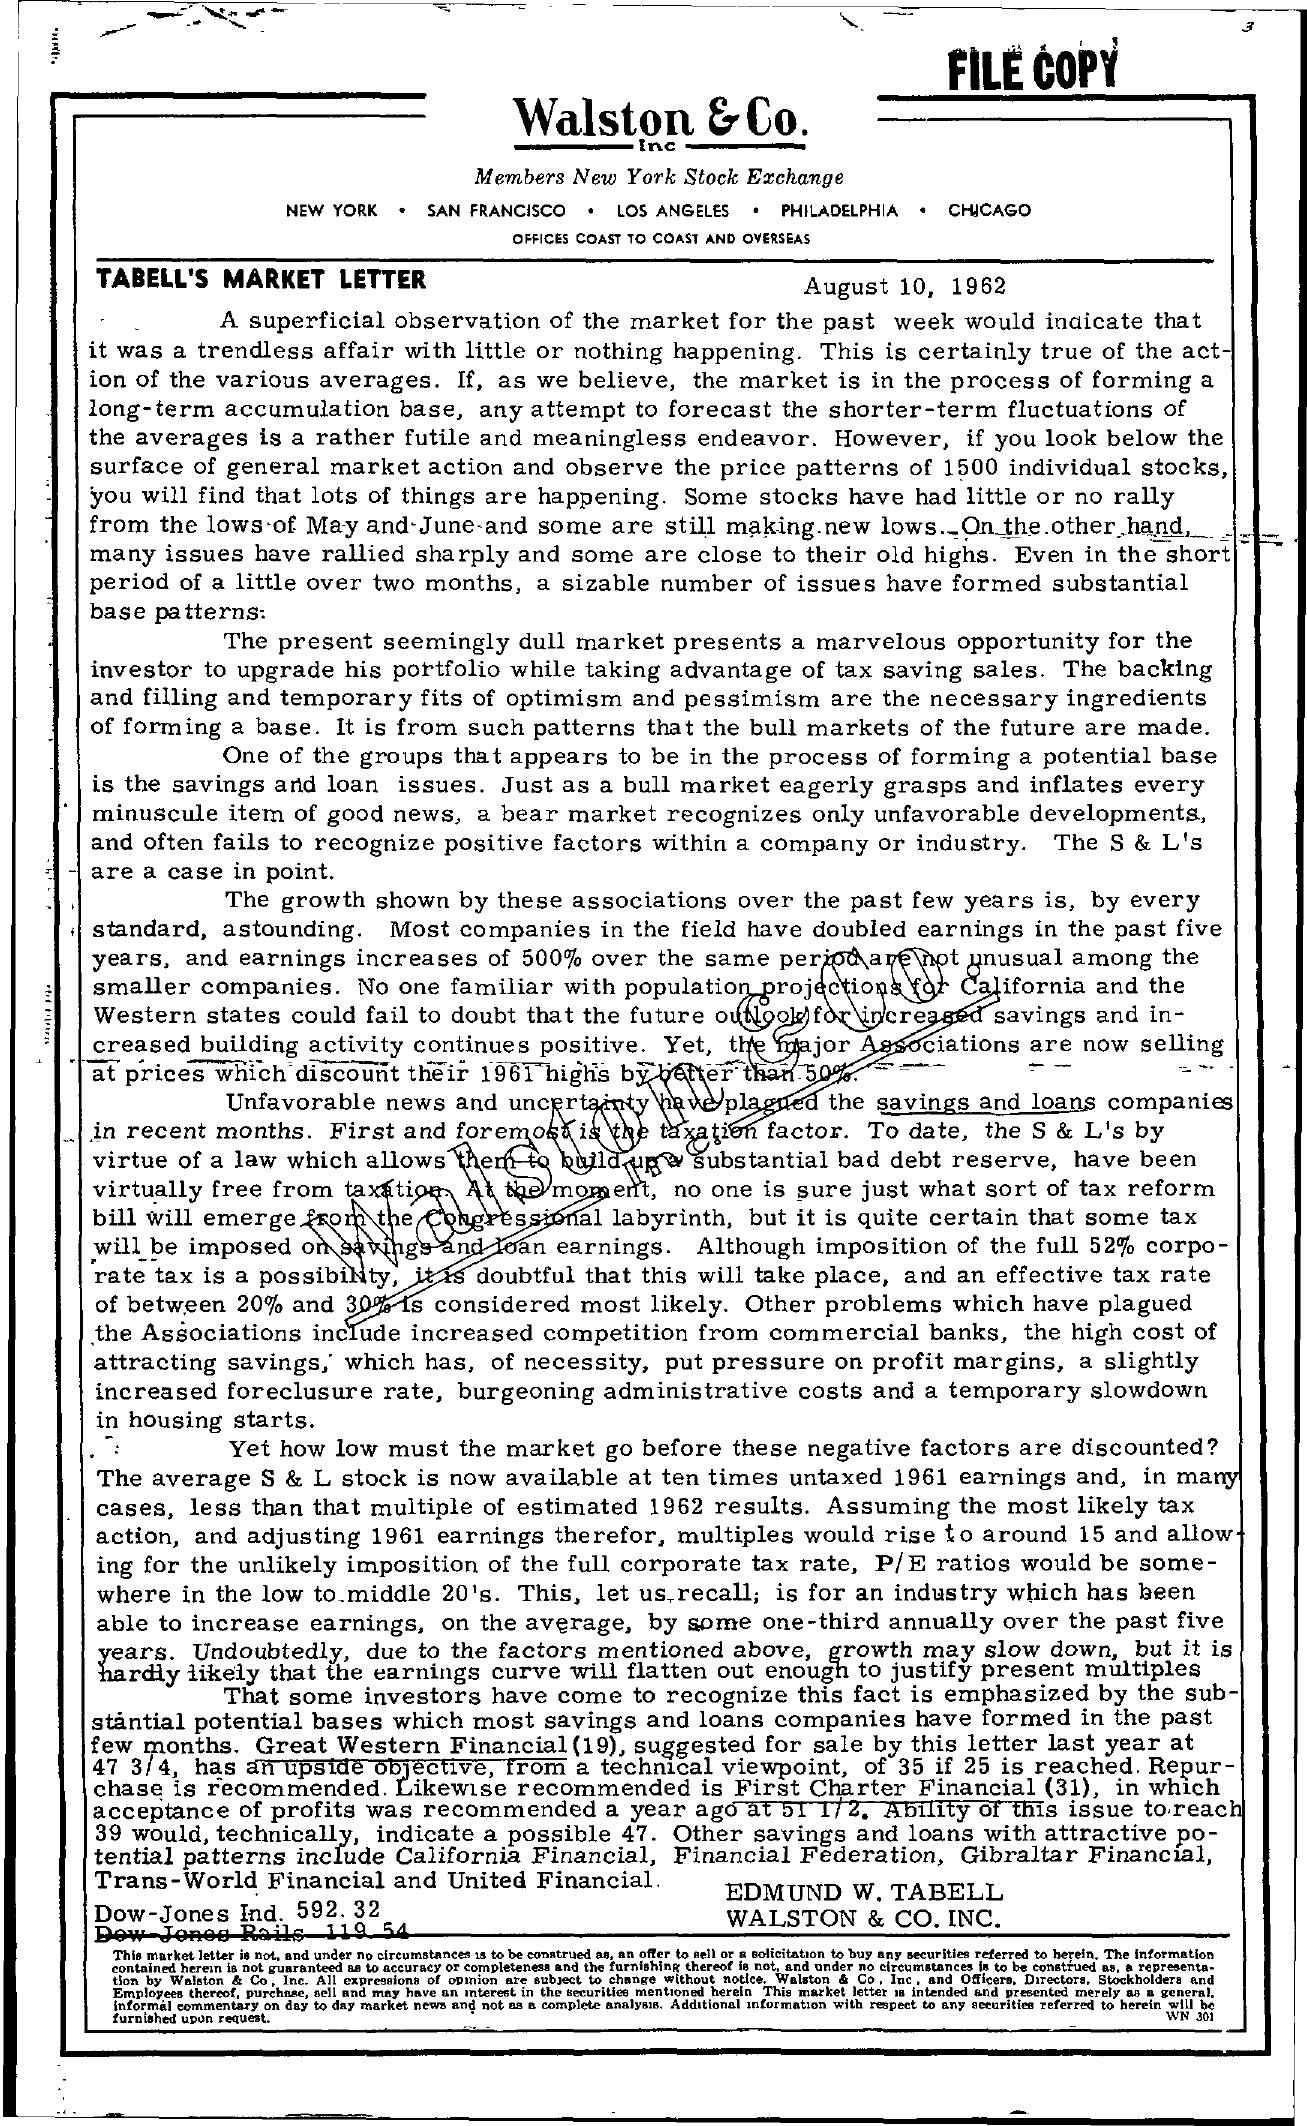 Tabell's Market Letter - August 10, 1962